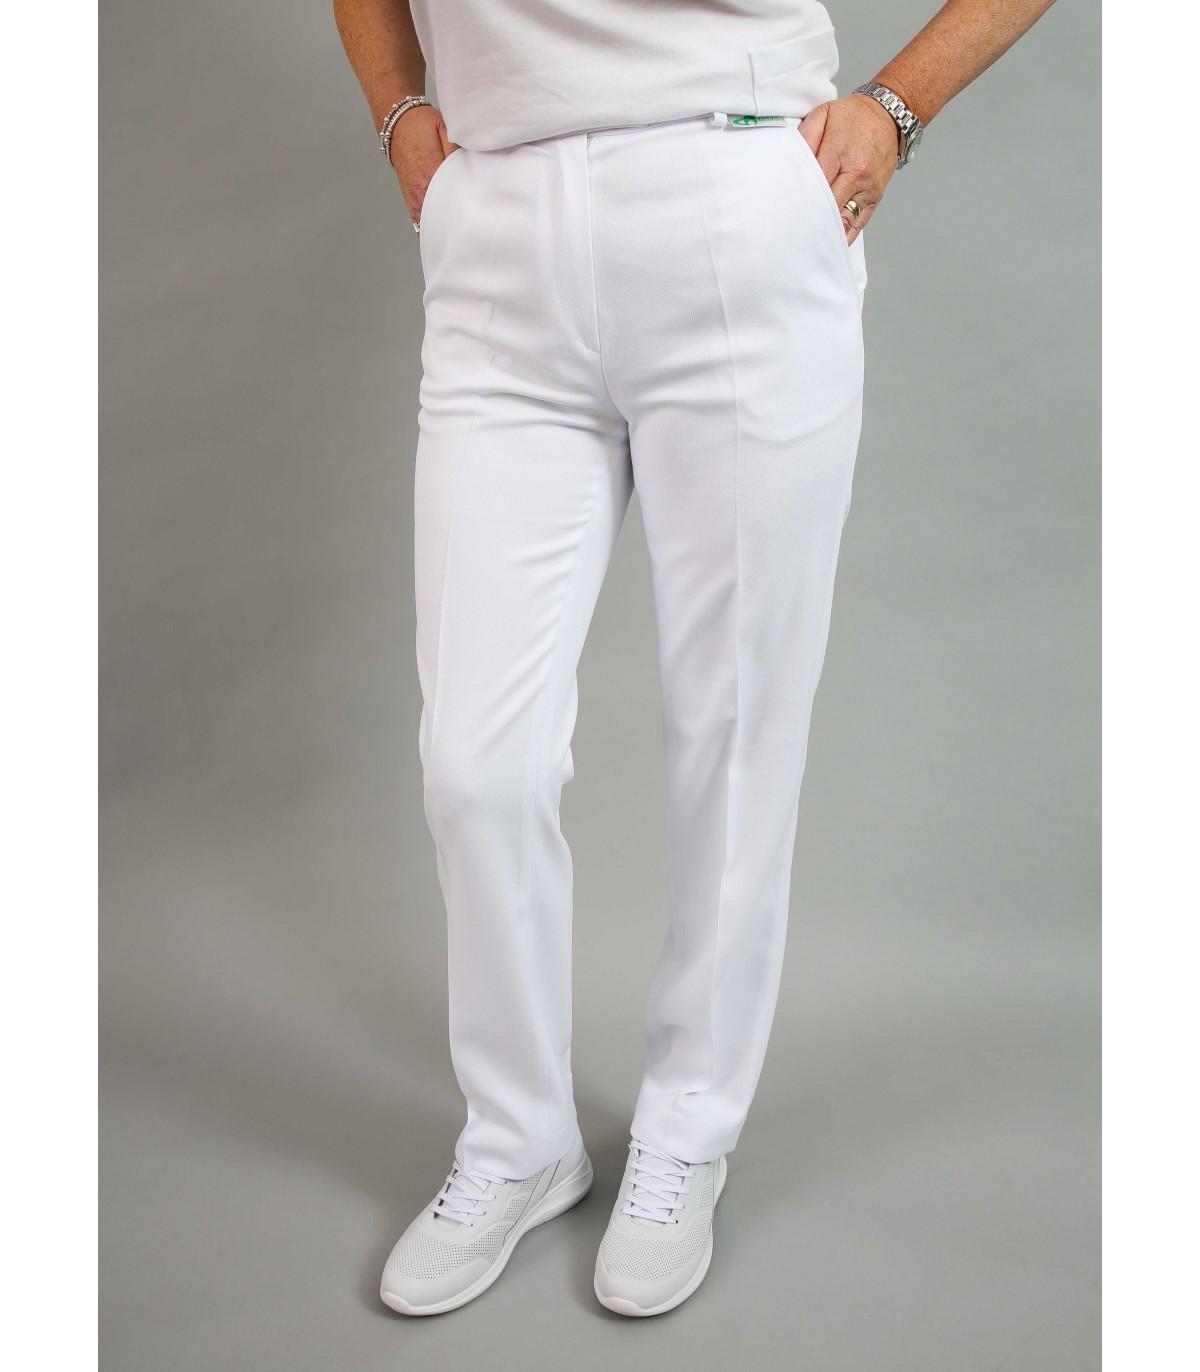 22 SHORT EMSMORN LADIES BI-STRETCH SLACKS TEFLON COATED white